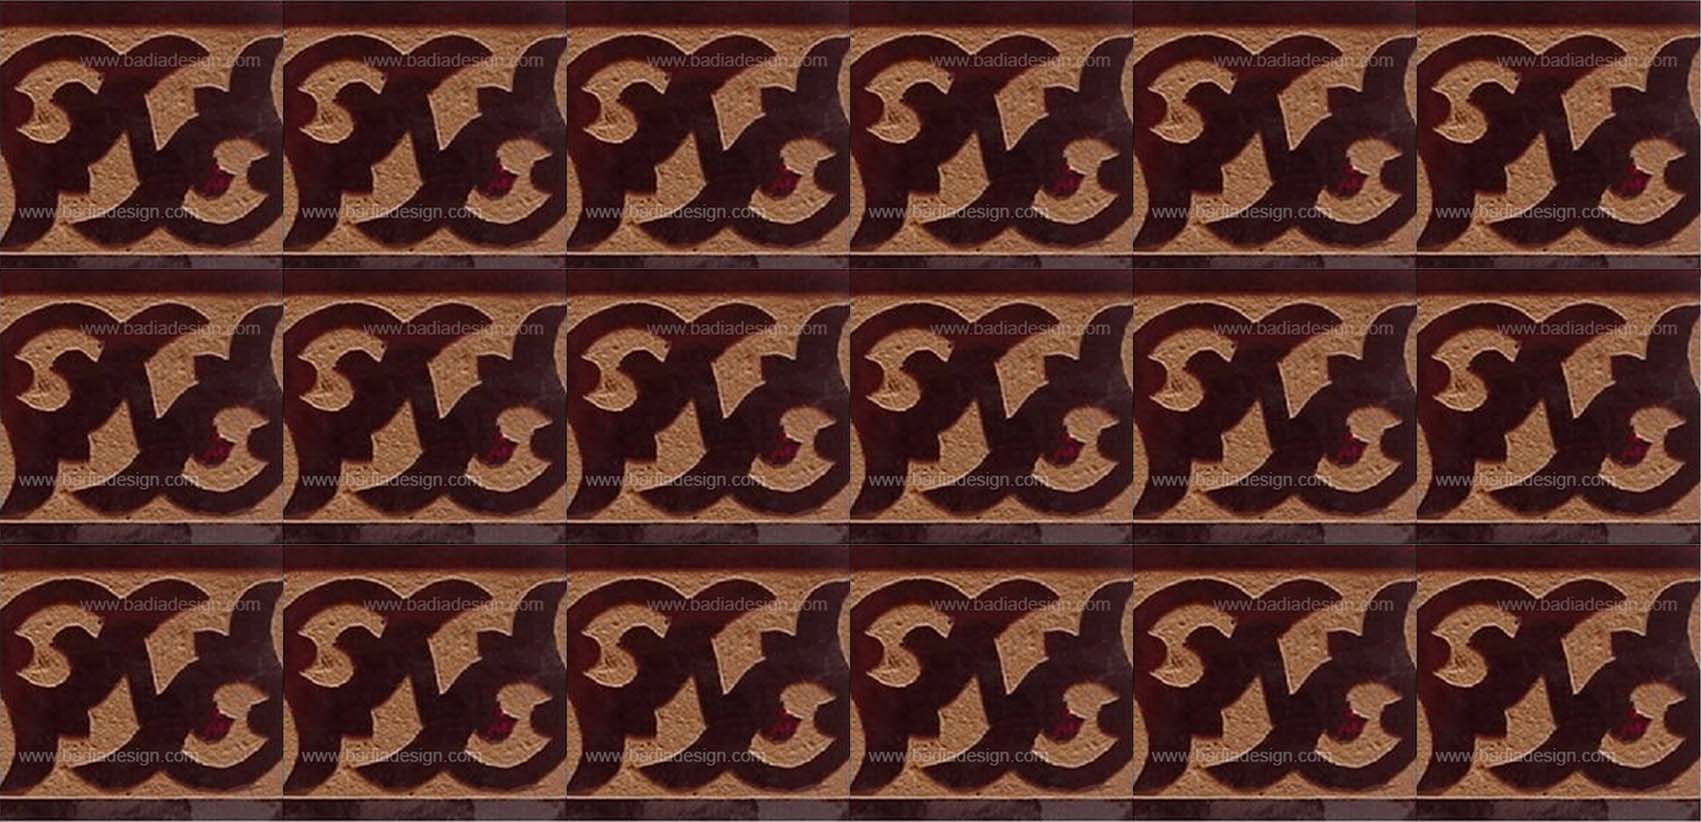 moroccan-hand-chiseled-tile-cht019-2.jpg